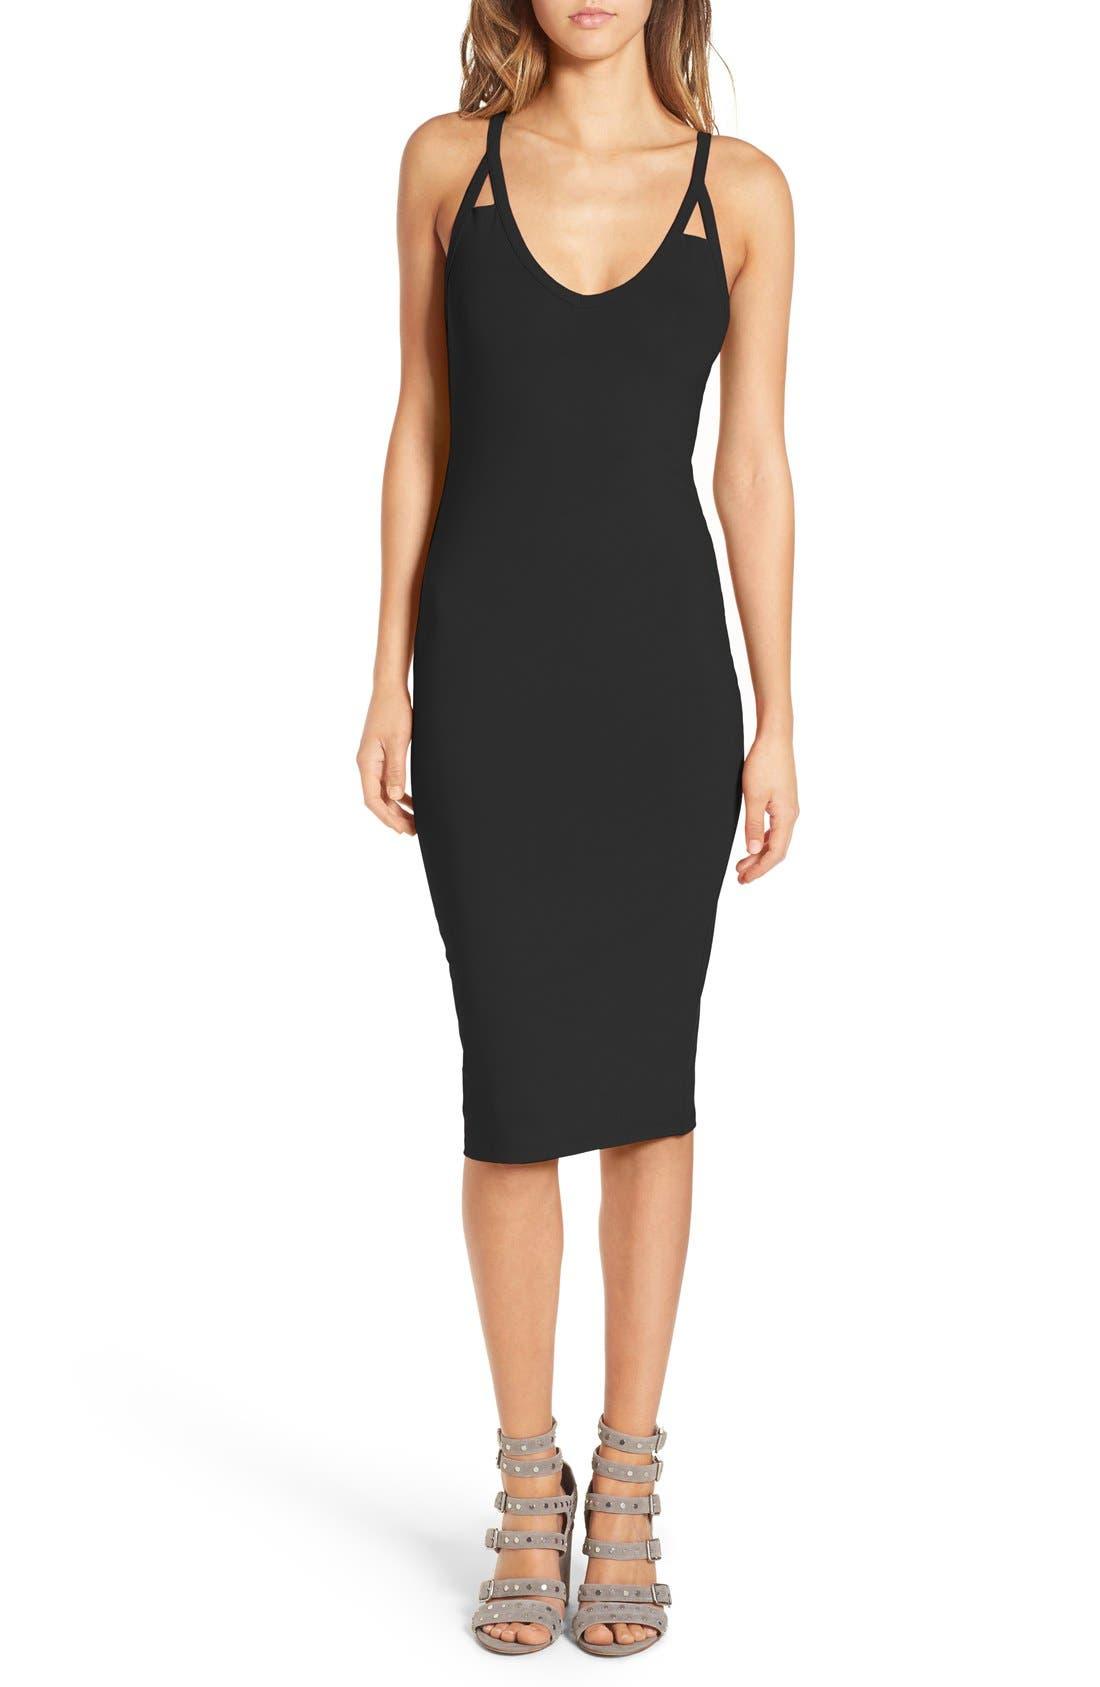 Alternate Image 1 Selected - Leith Cutout Strap Body-Con Dress